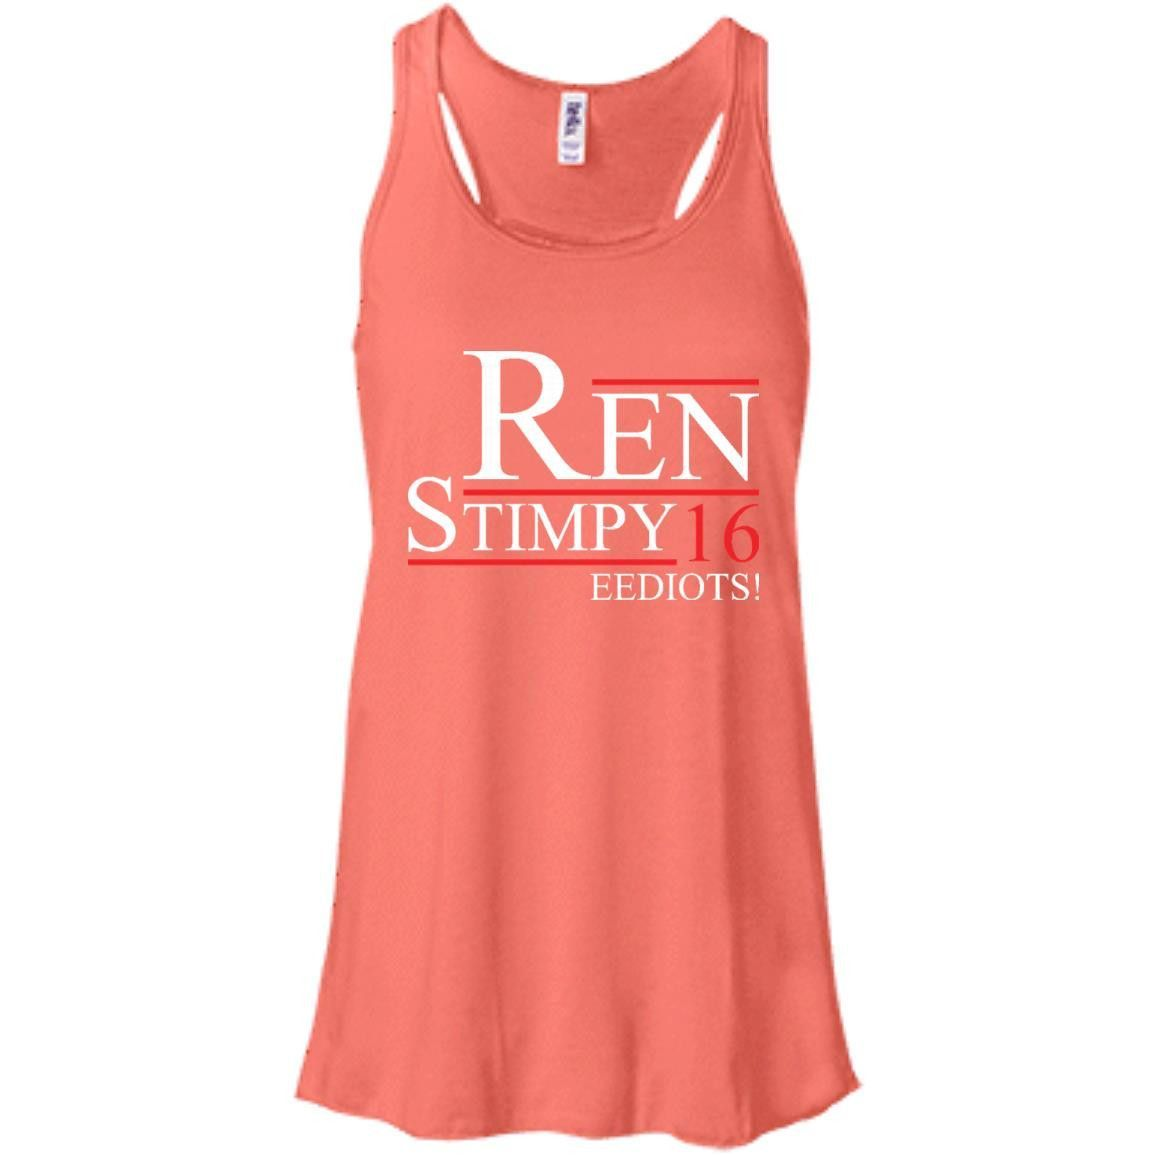 EEDIOTS! Ren Stimpy 2016 T-Shirt -01 Bella + Canvas Flowy Racerback Tank